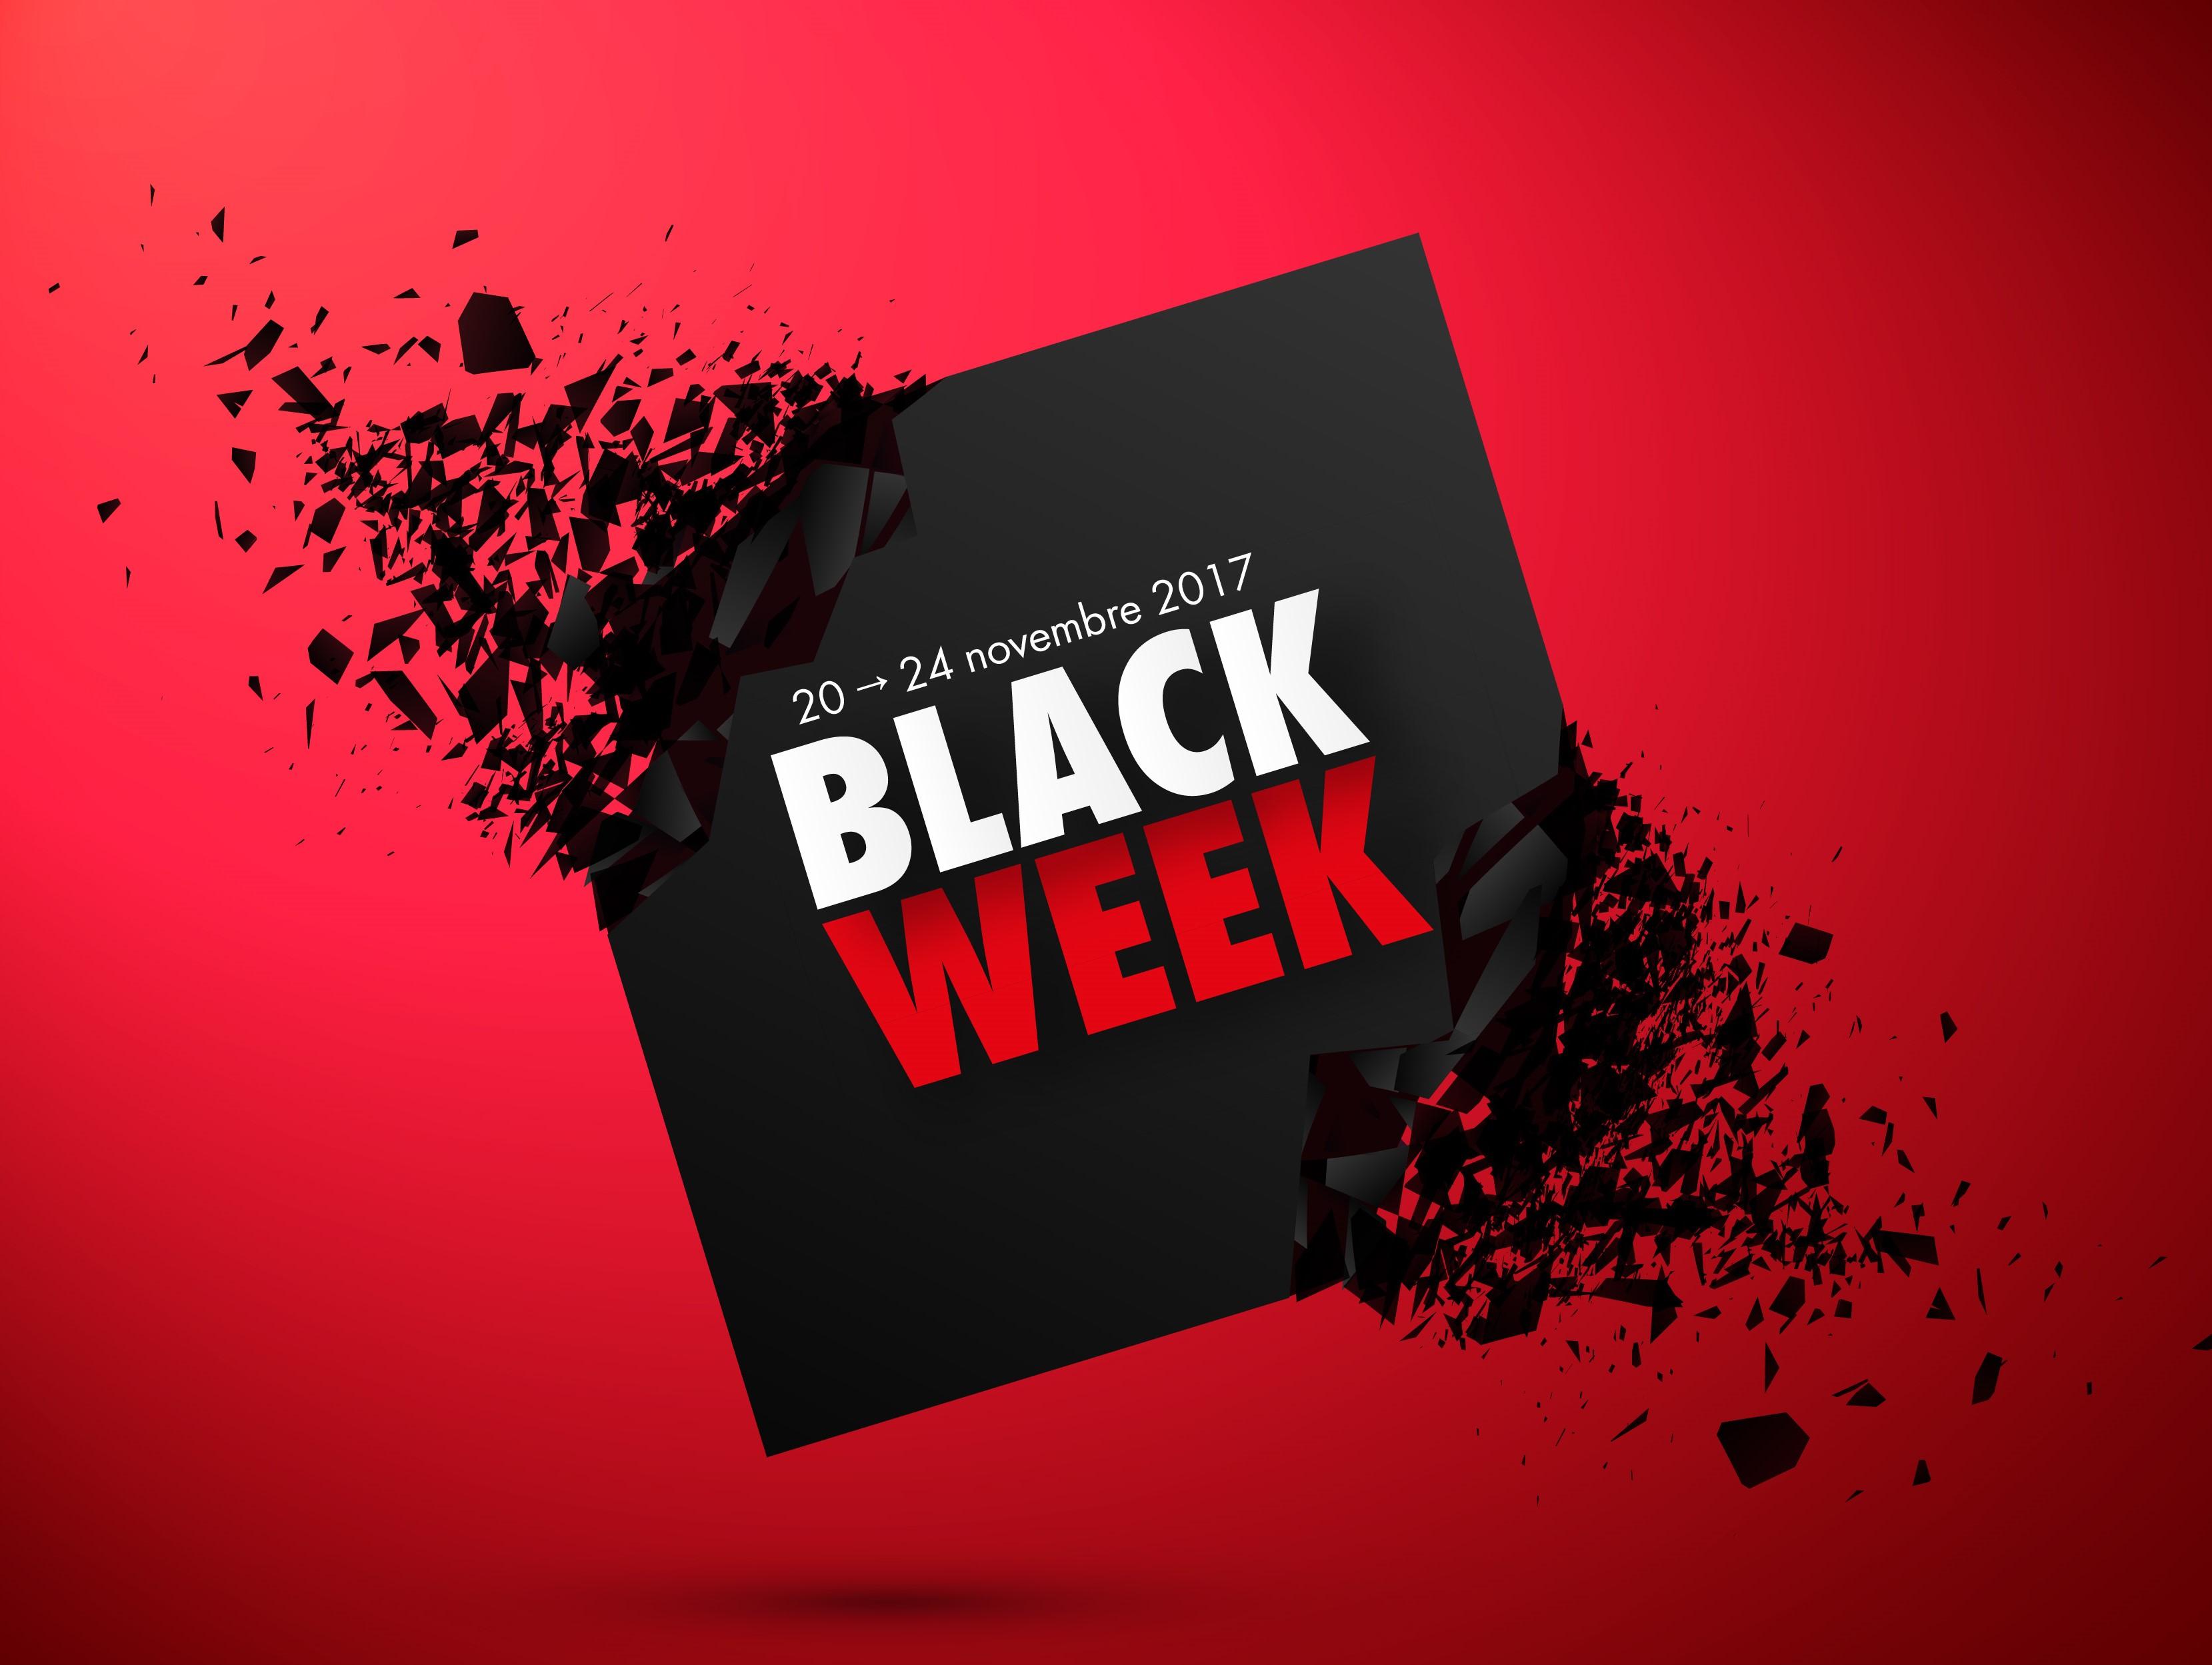 offres exceptionnelles pendant la black week by w rth am today. Black Bedroom Furniture Sets. Home Design Ideas